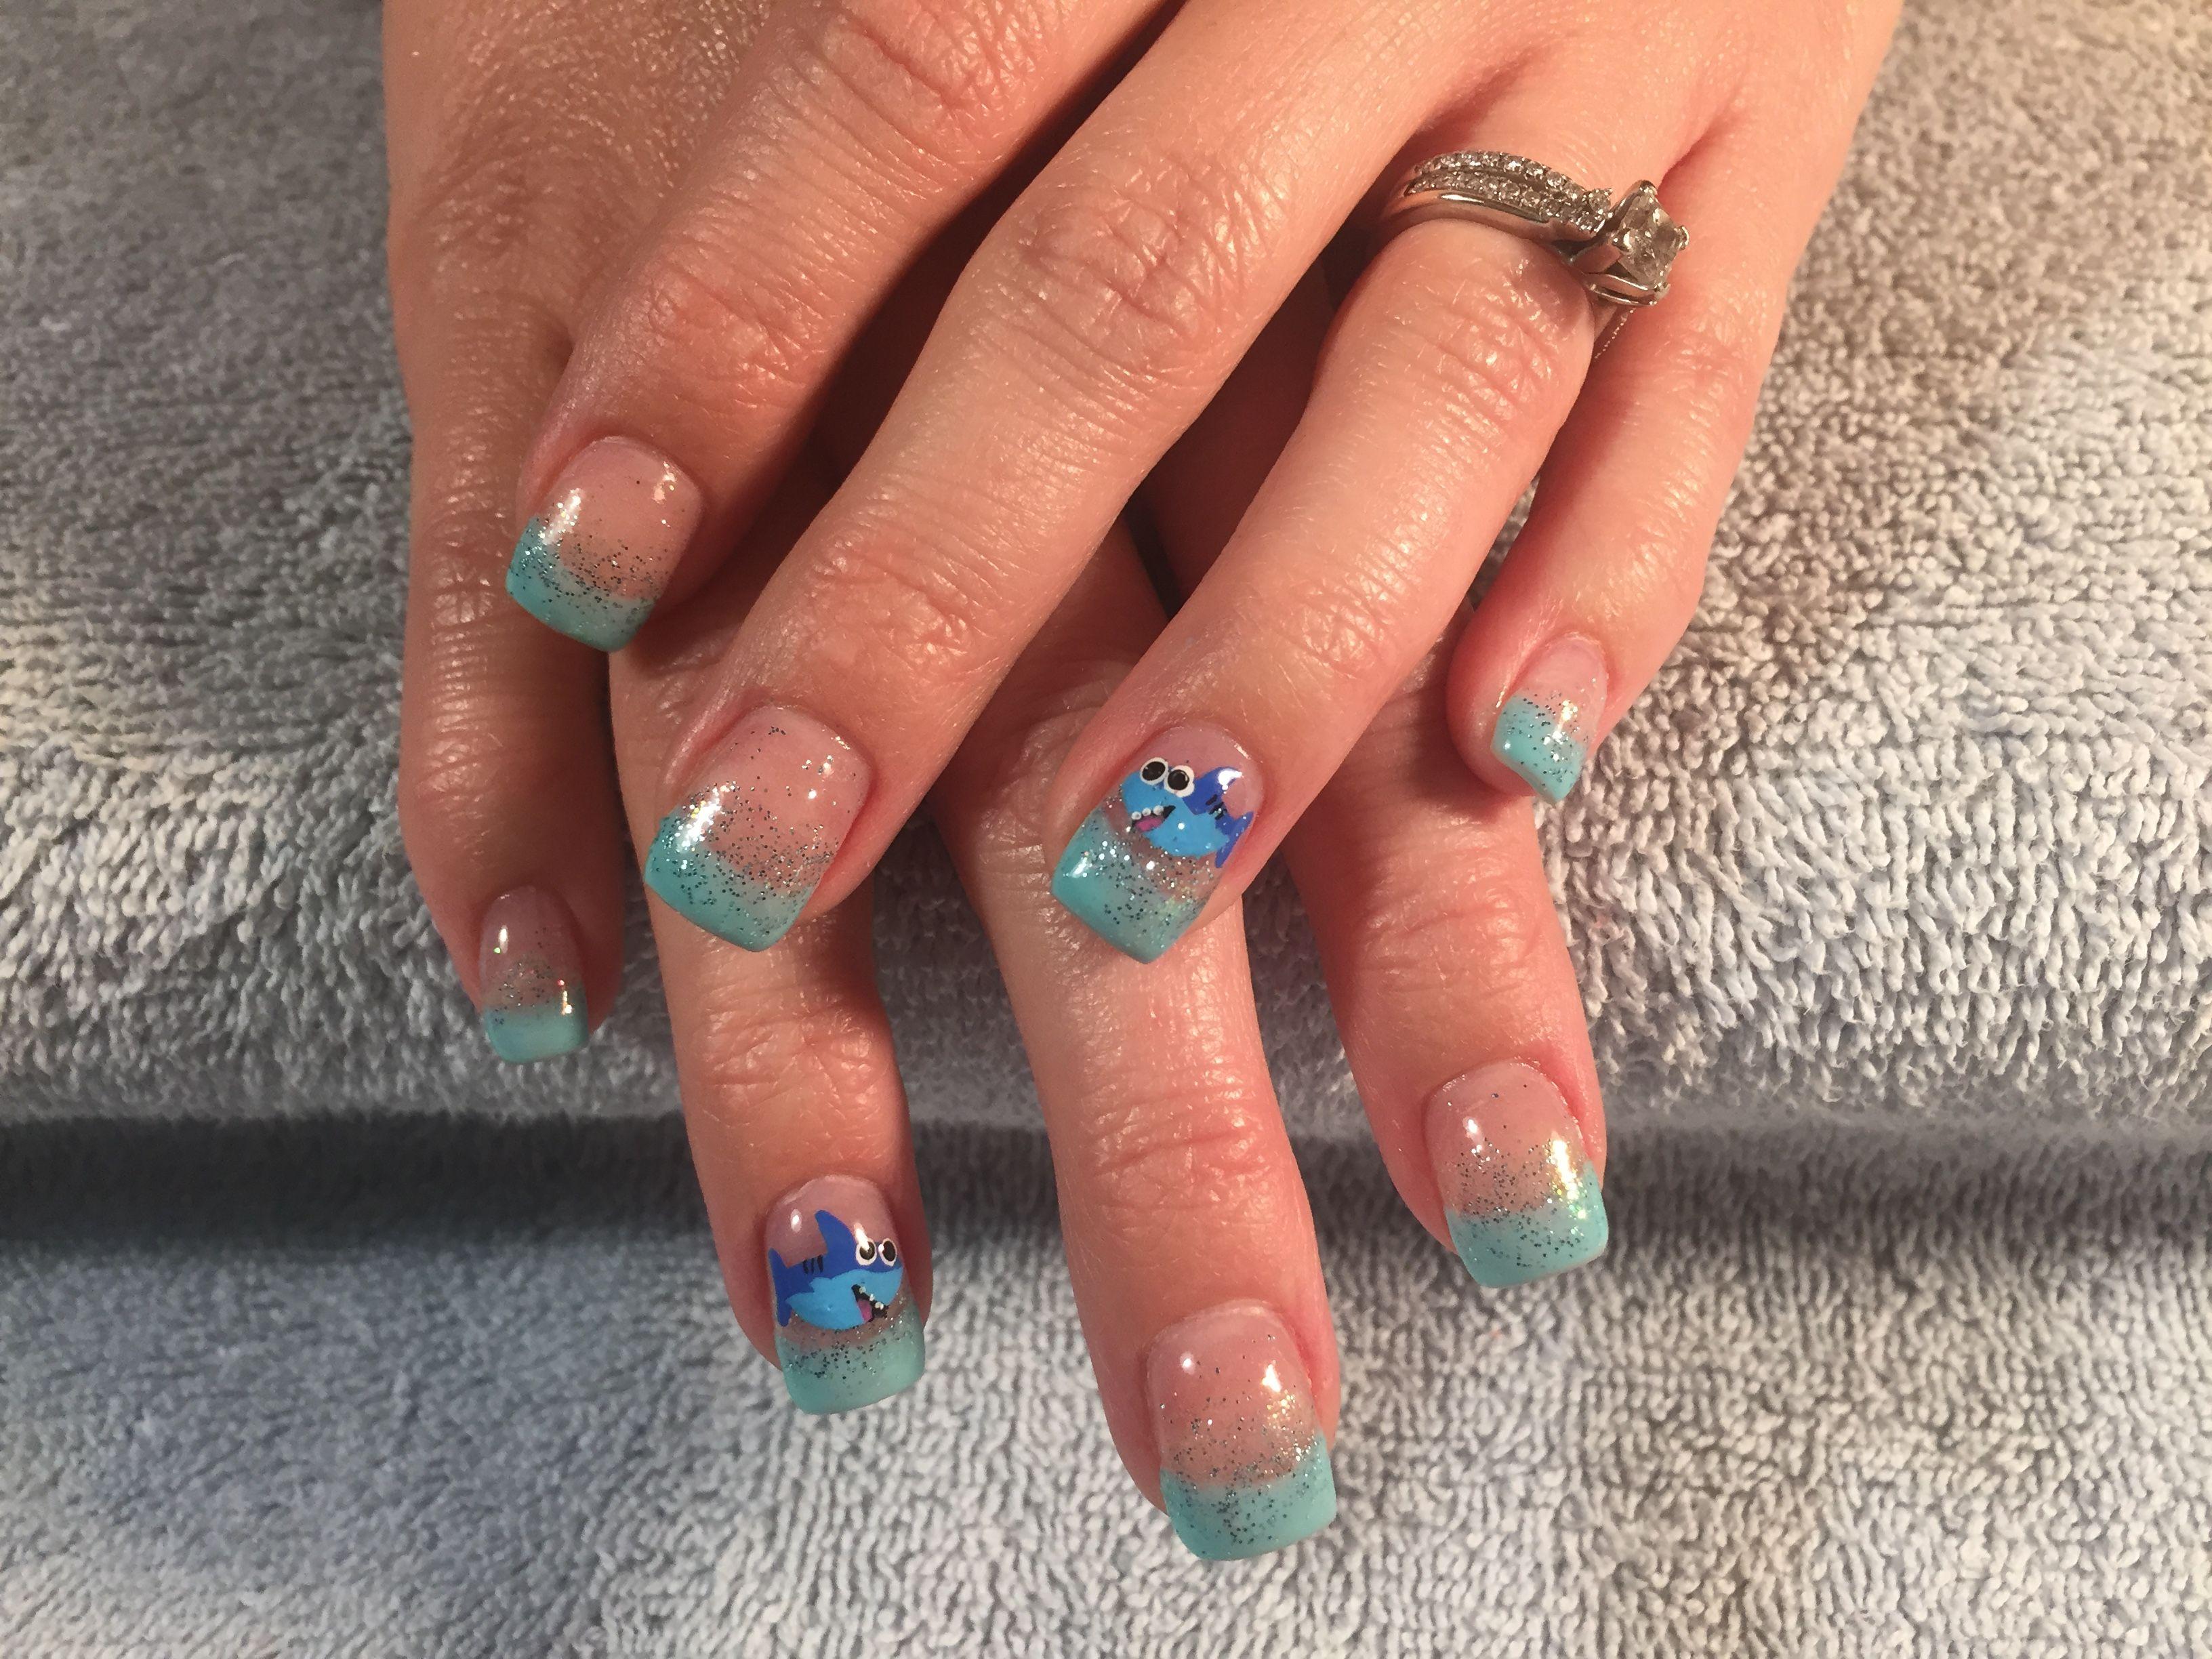 Baby Shark nail art | Amanda nail art | Pinterest | Baby shark